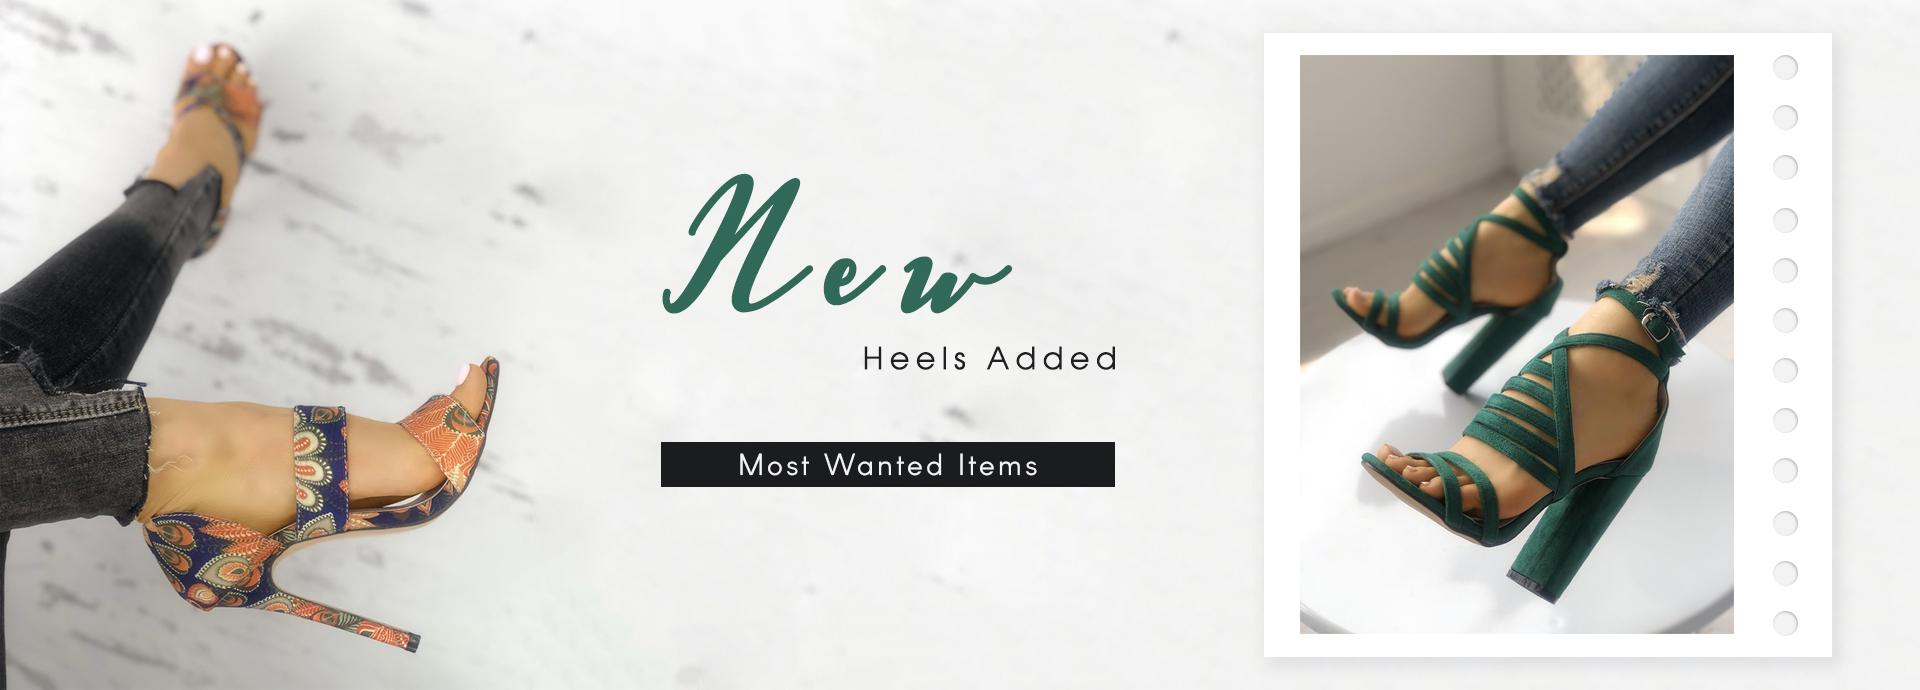 New Heels Added